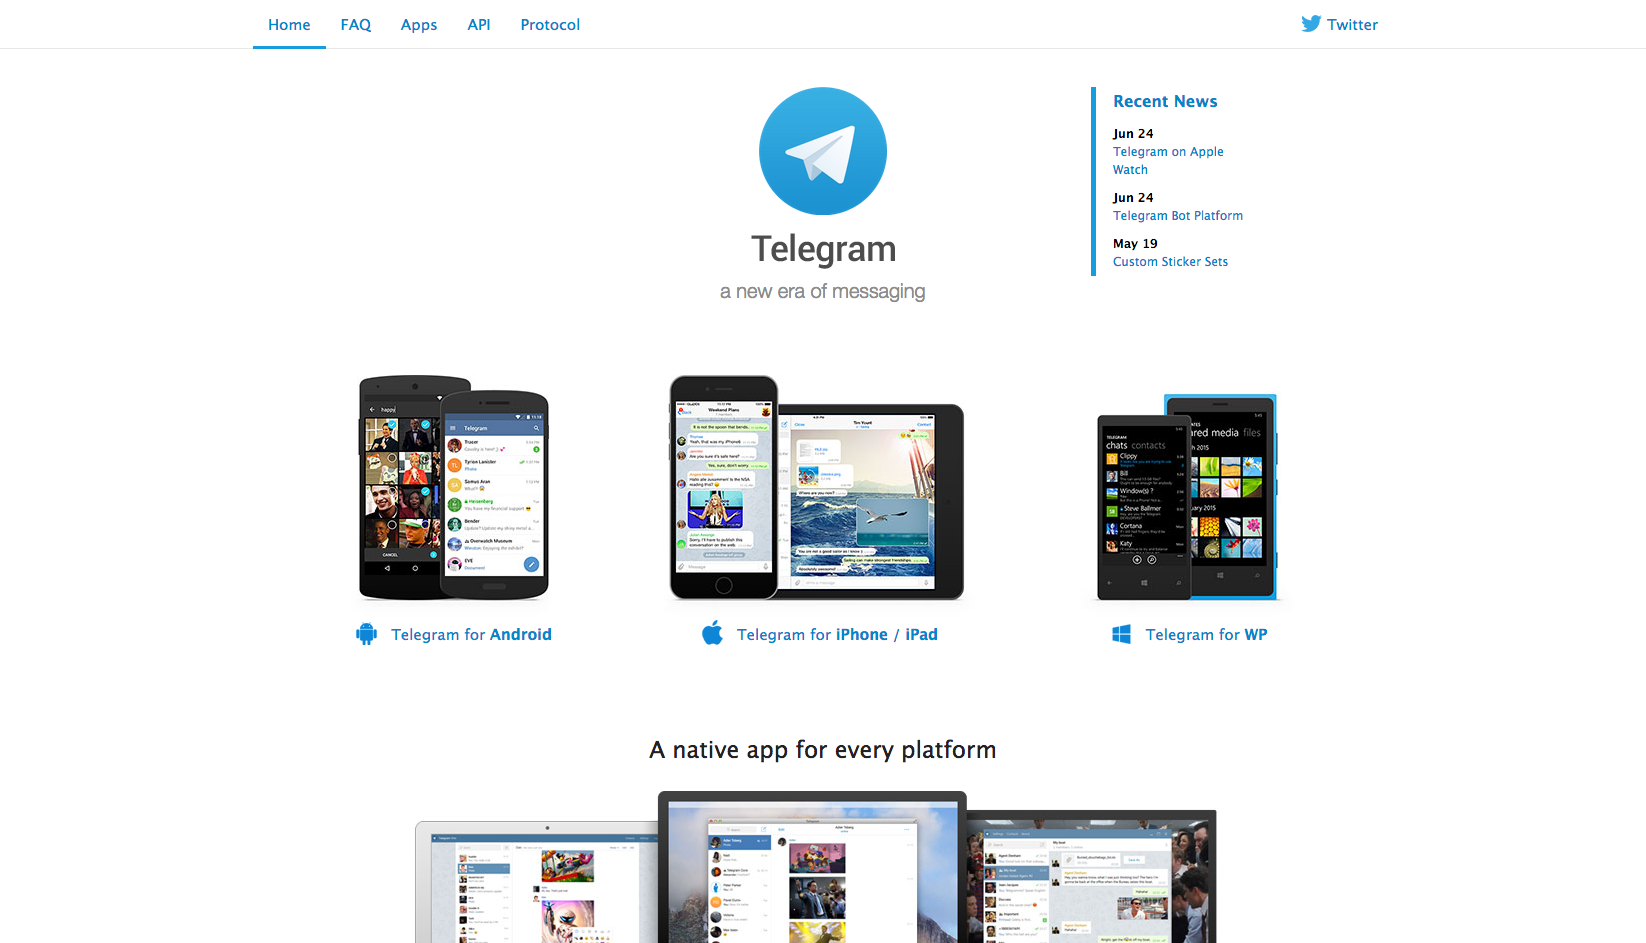 Messaging app, App, Messages